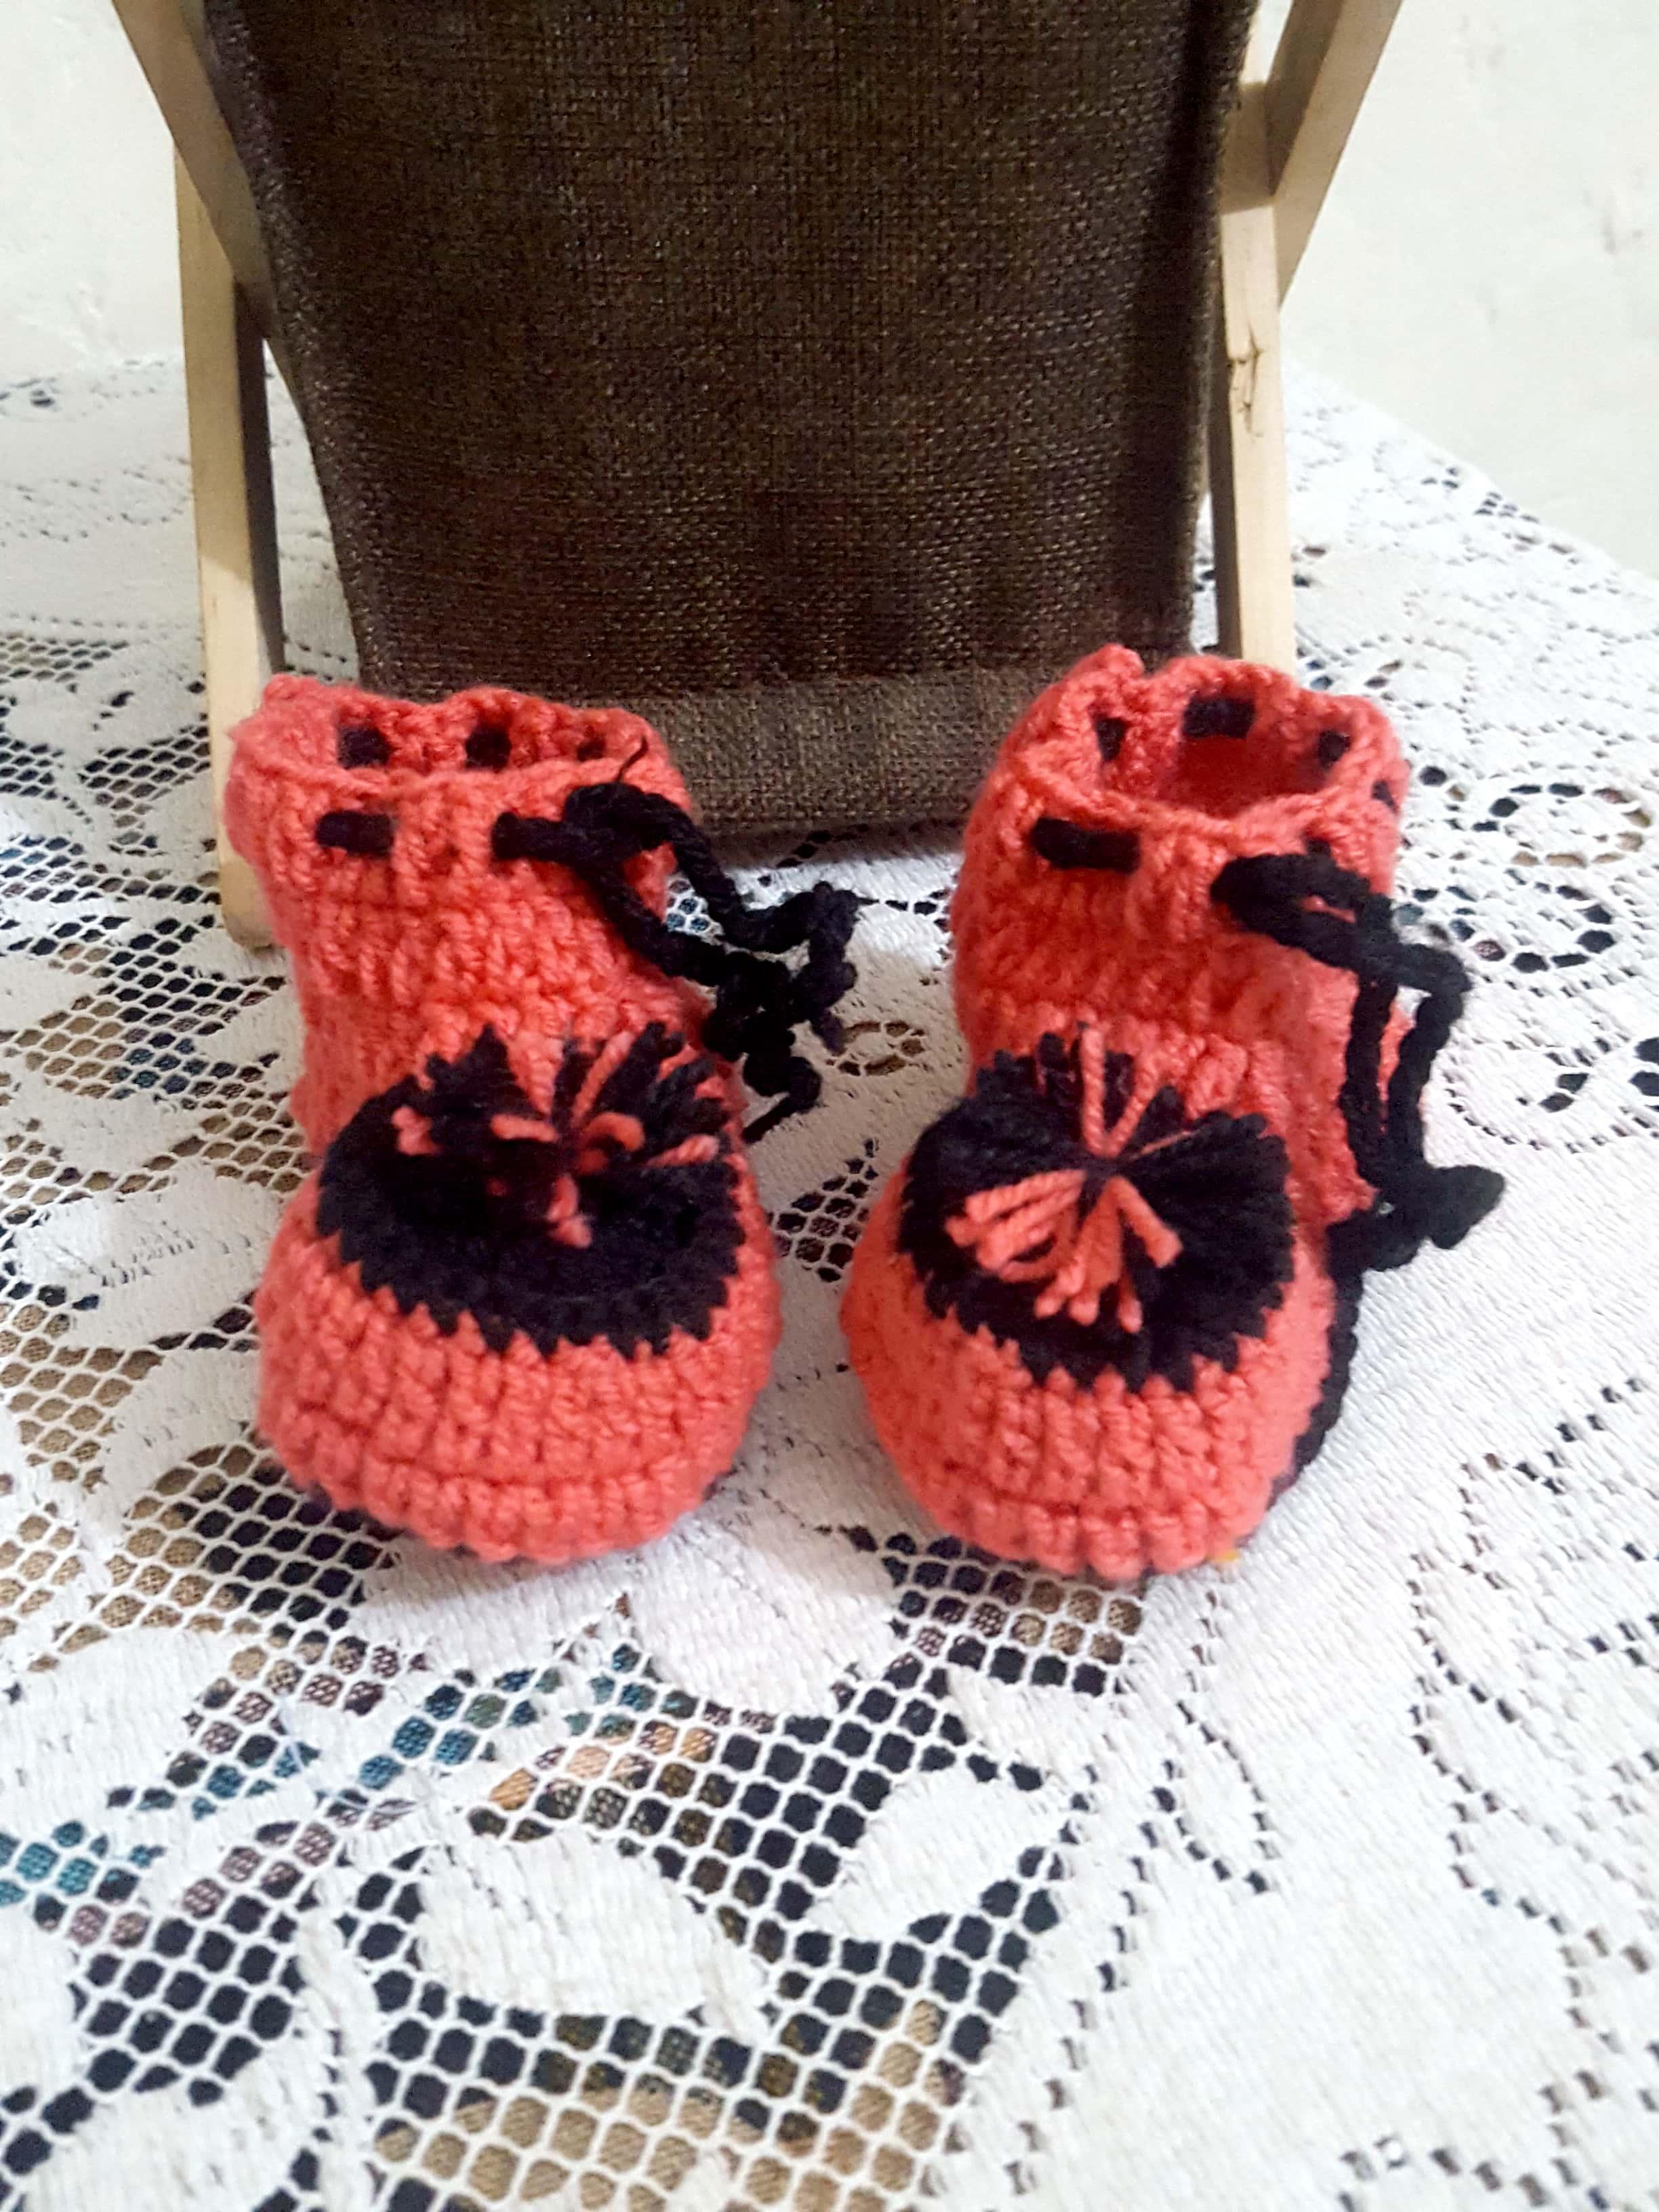 Handmade Knit Crochet Baby Shoes/ Booties, Newborn Socks/ Shoes